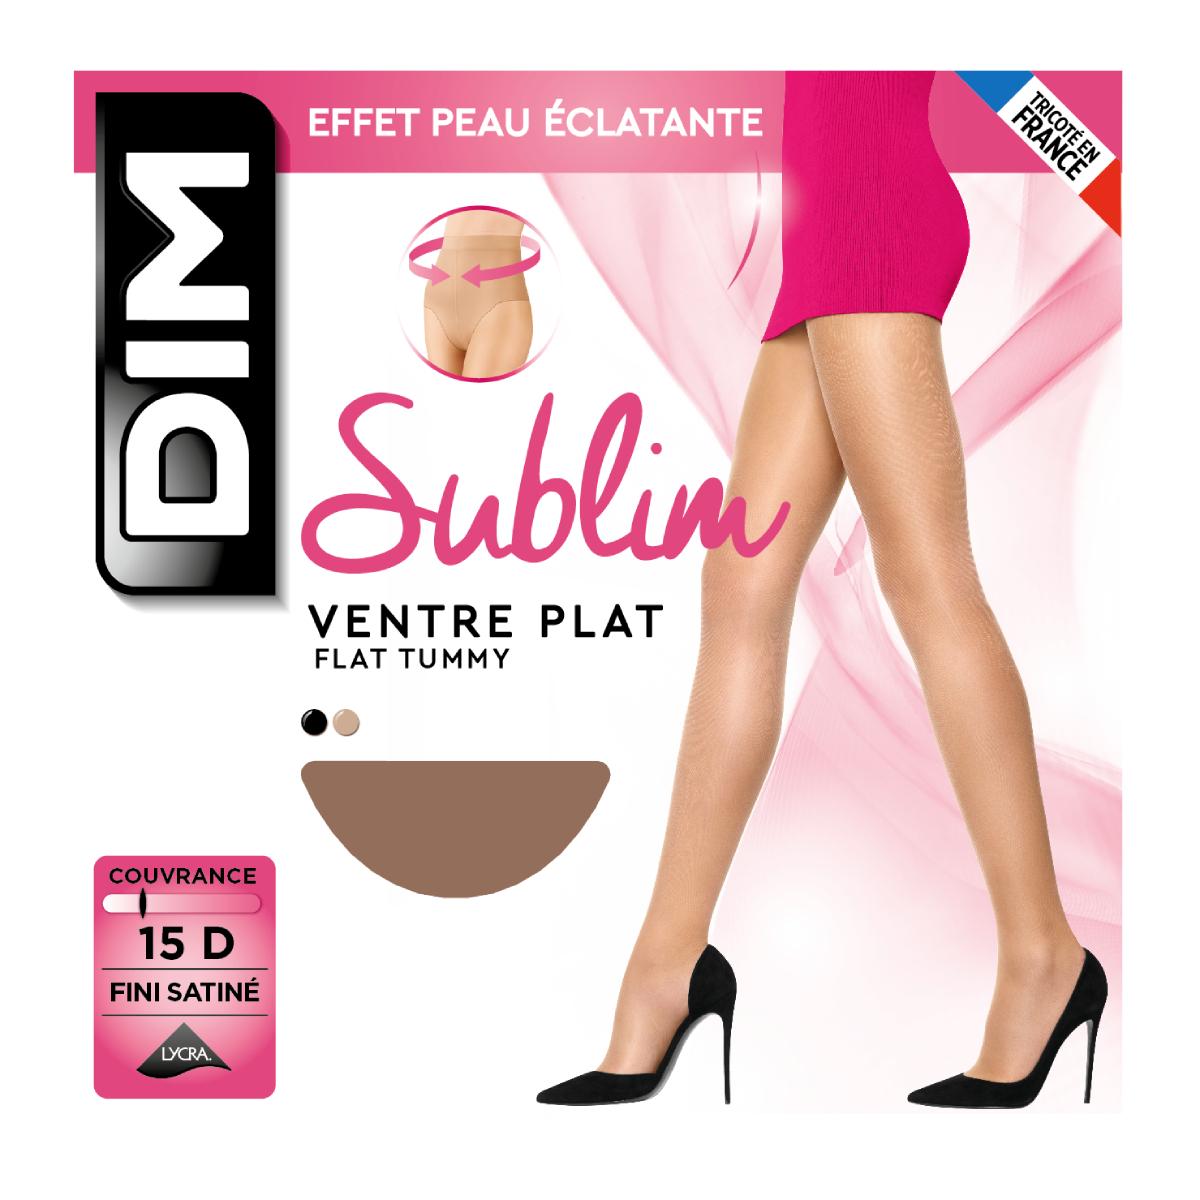 Gazelle Sublim Ventre Plat 15 tummy-flattening tights